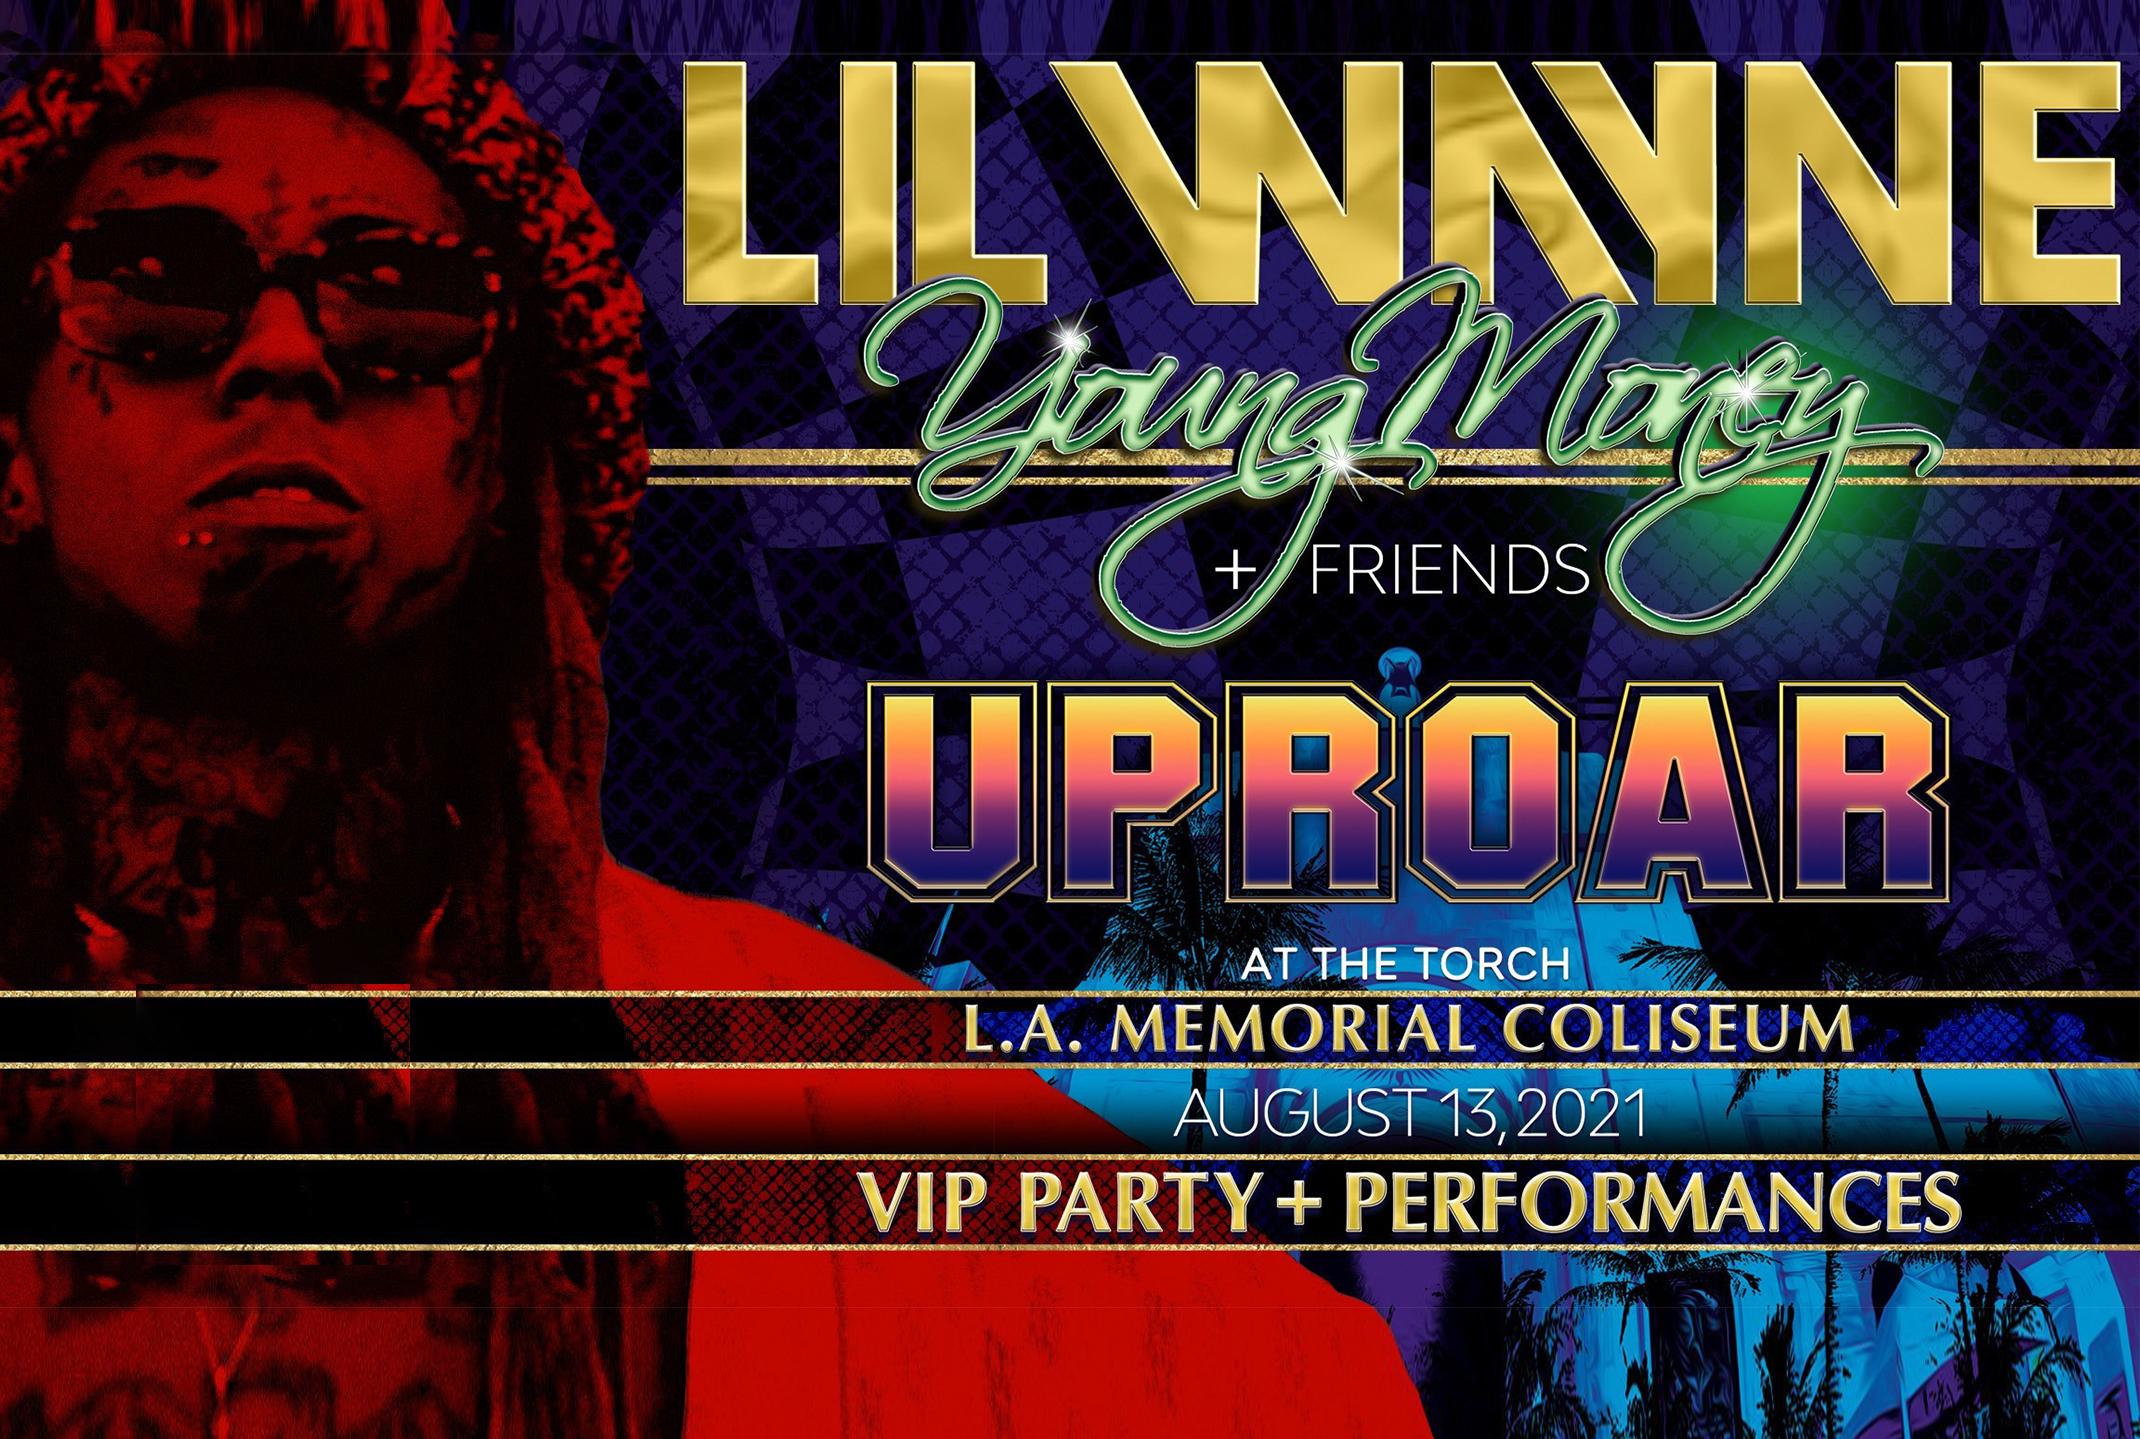 UPROAR – Lil Wayne, Young Money & Friends